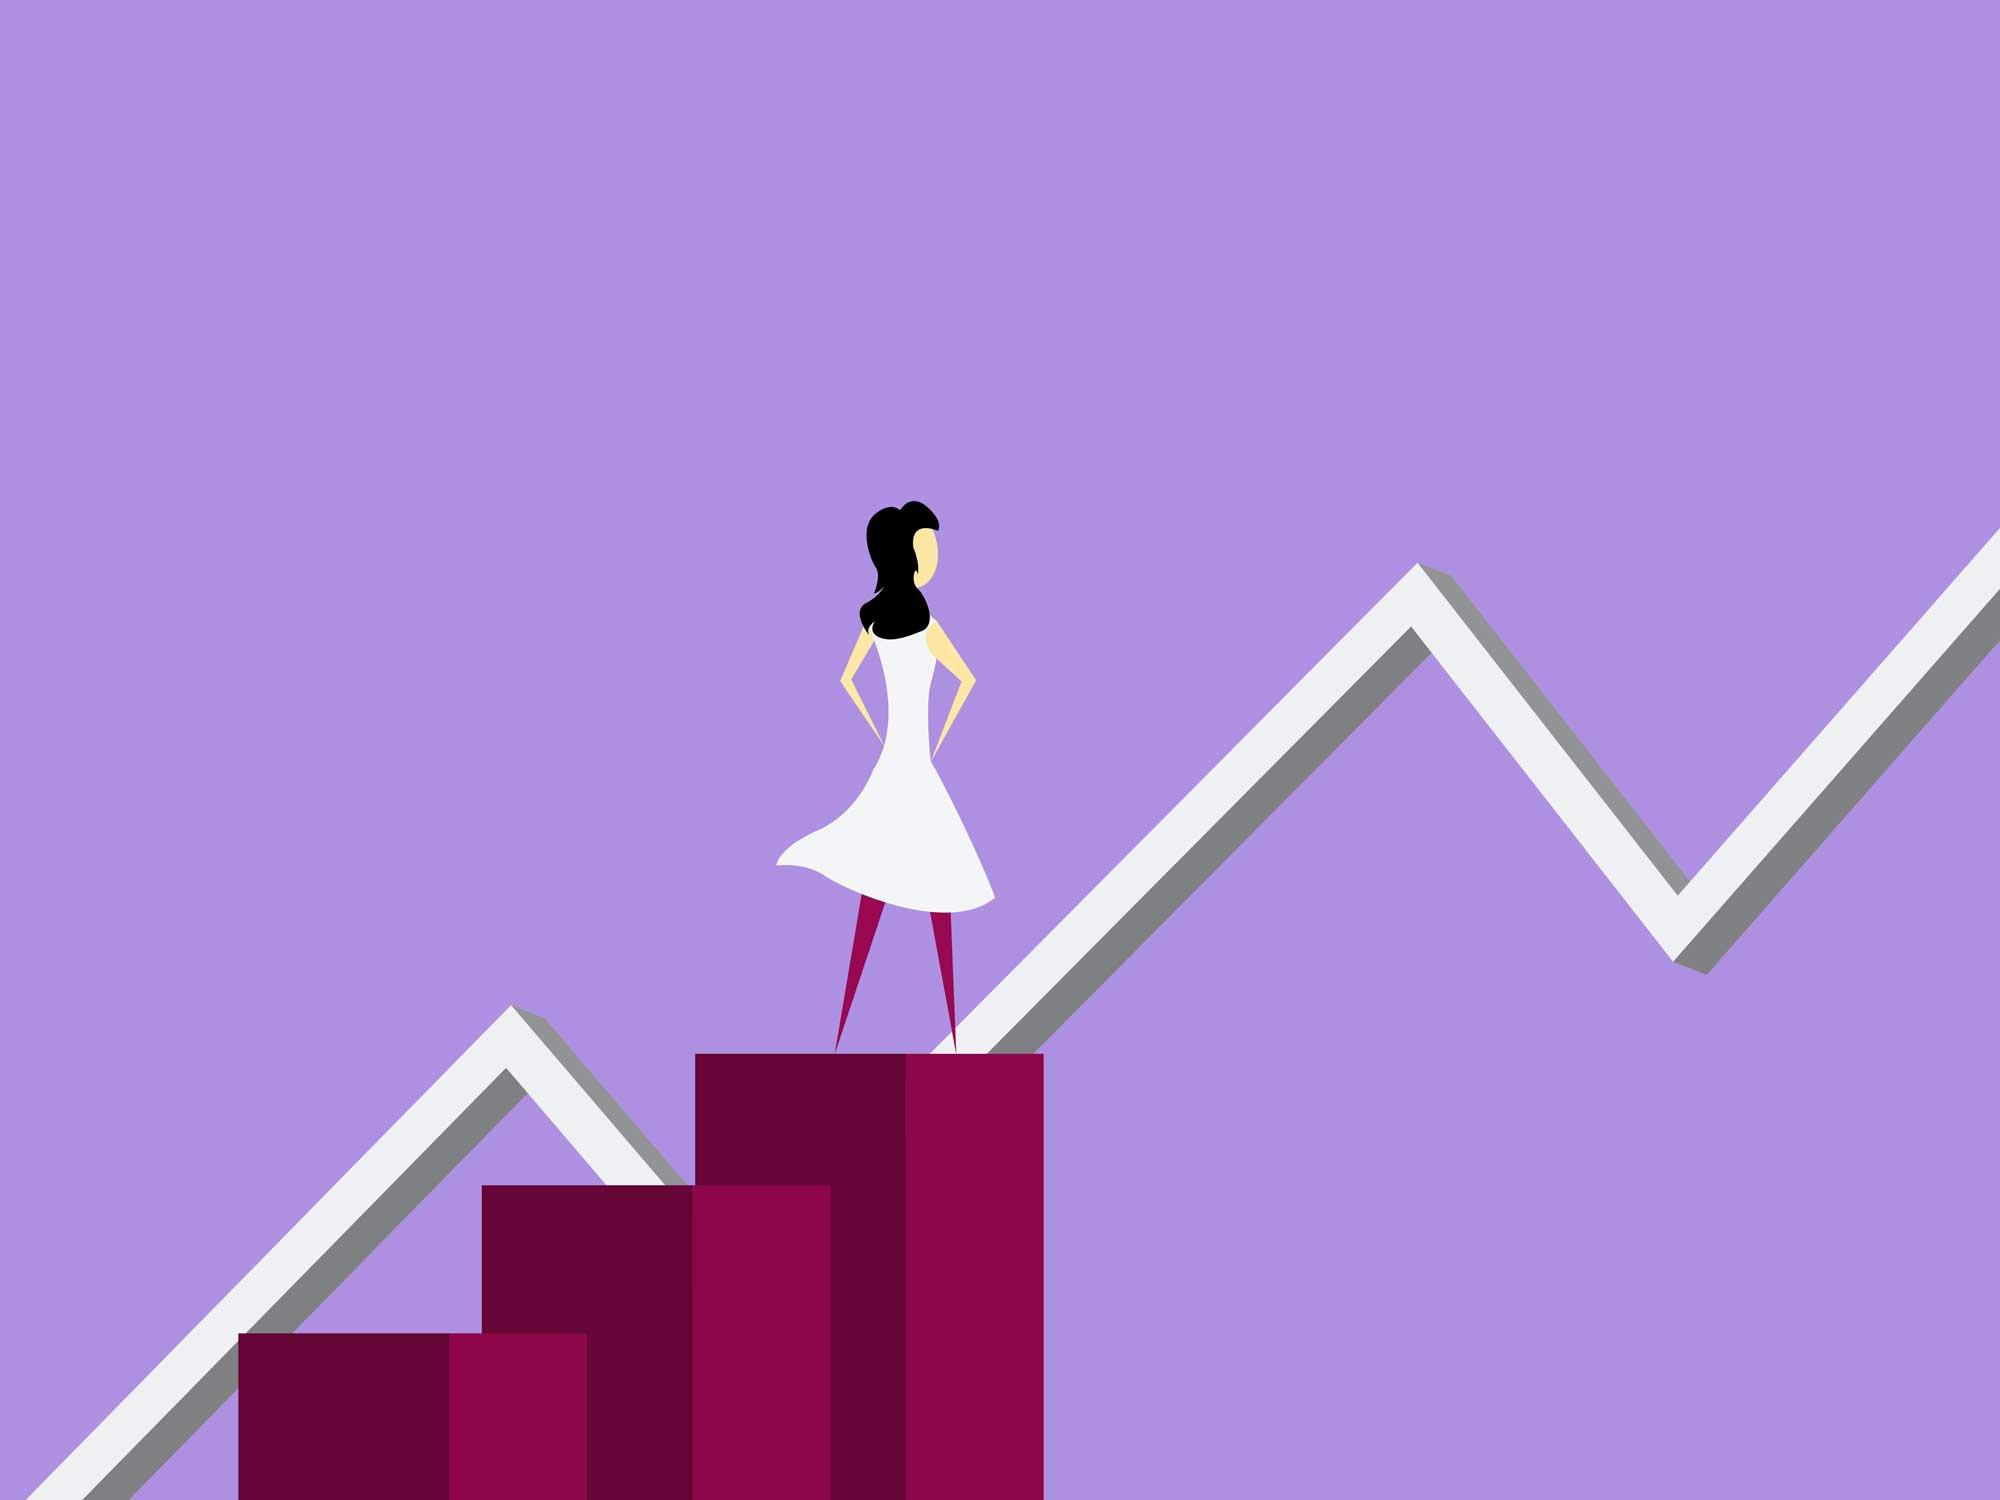 Frau steht auf Treppe_Graph_steigt_an